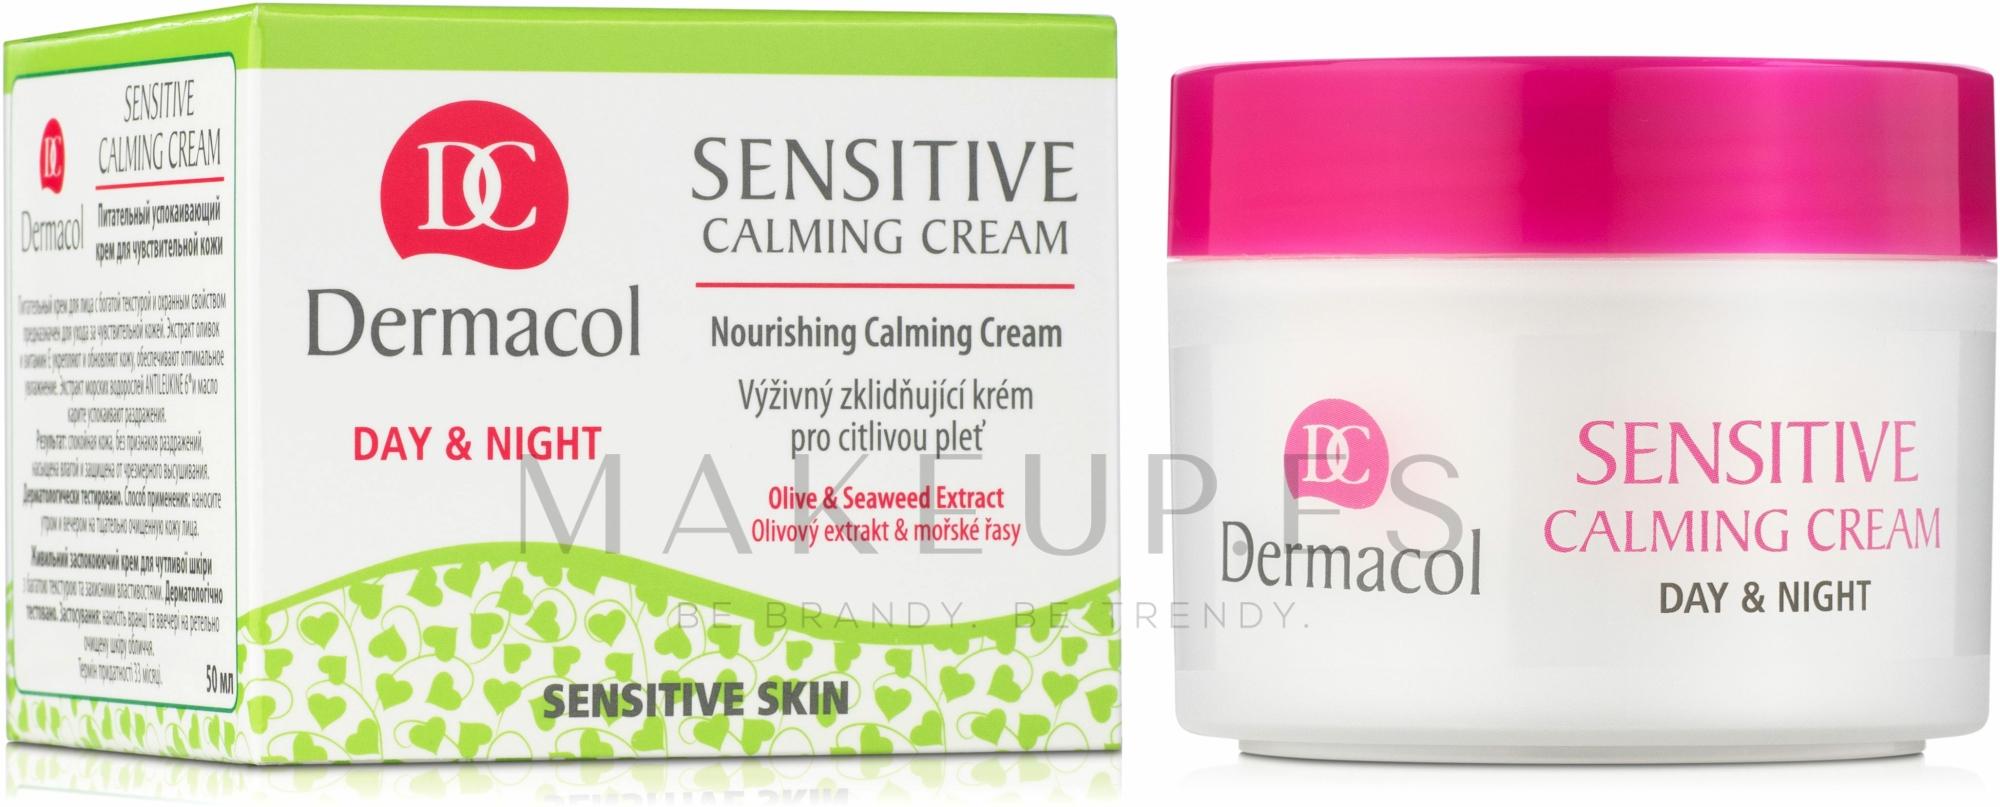 Crema facial calmante con extracto de algas - Dermacol Sensitive Calming Cream — imagen 50 ml